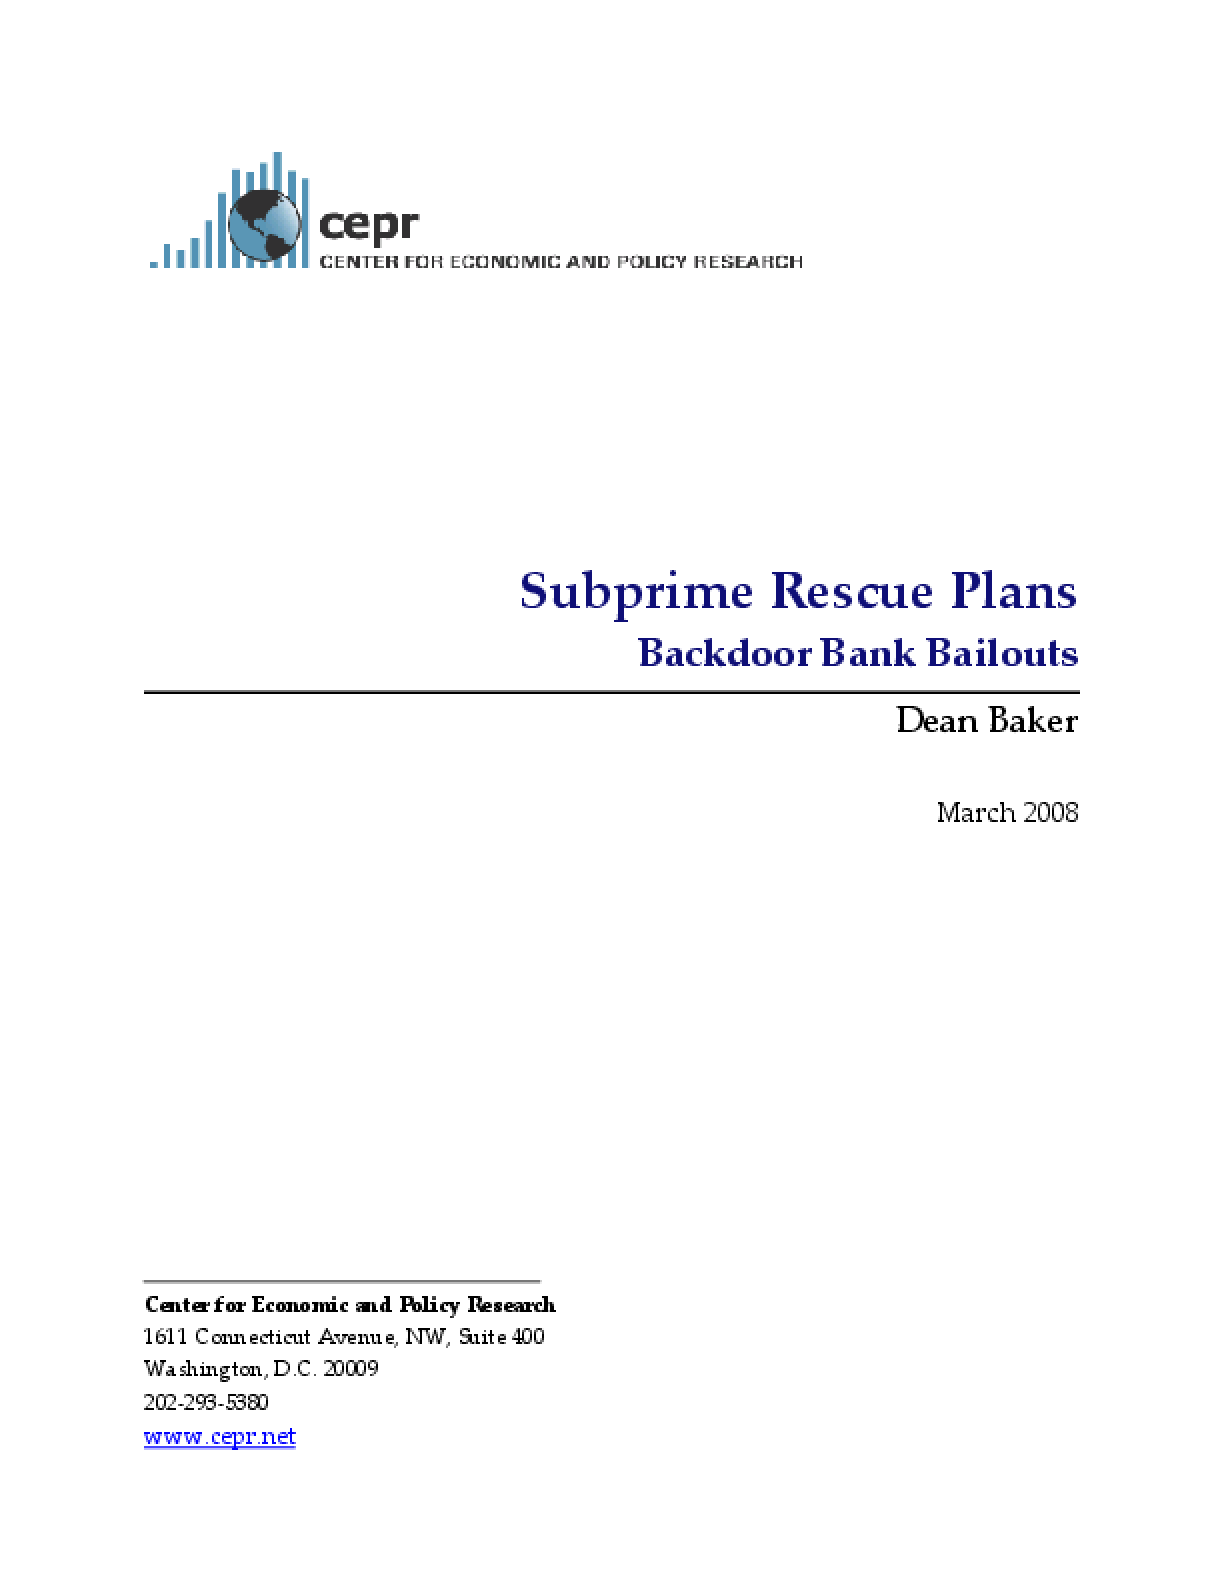 Subprime Rescue Plans: Backdoor Bank Bailouts